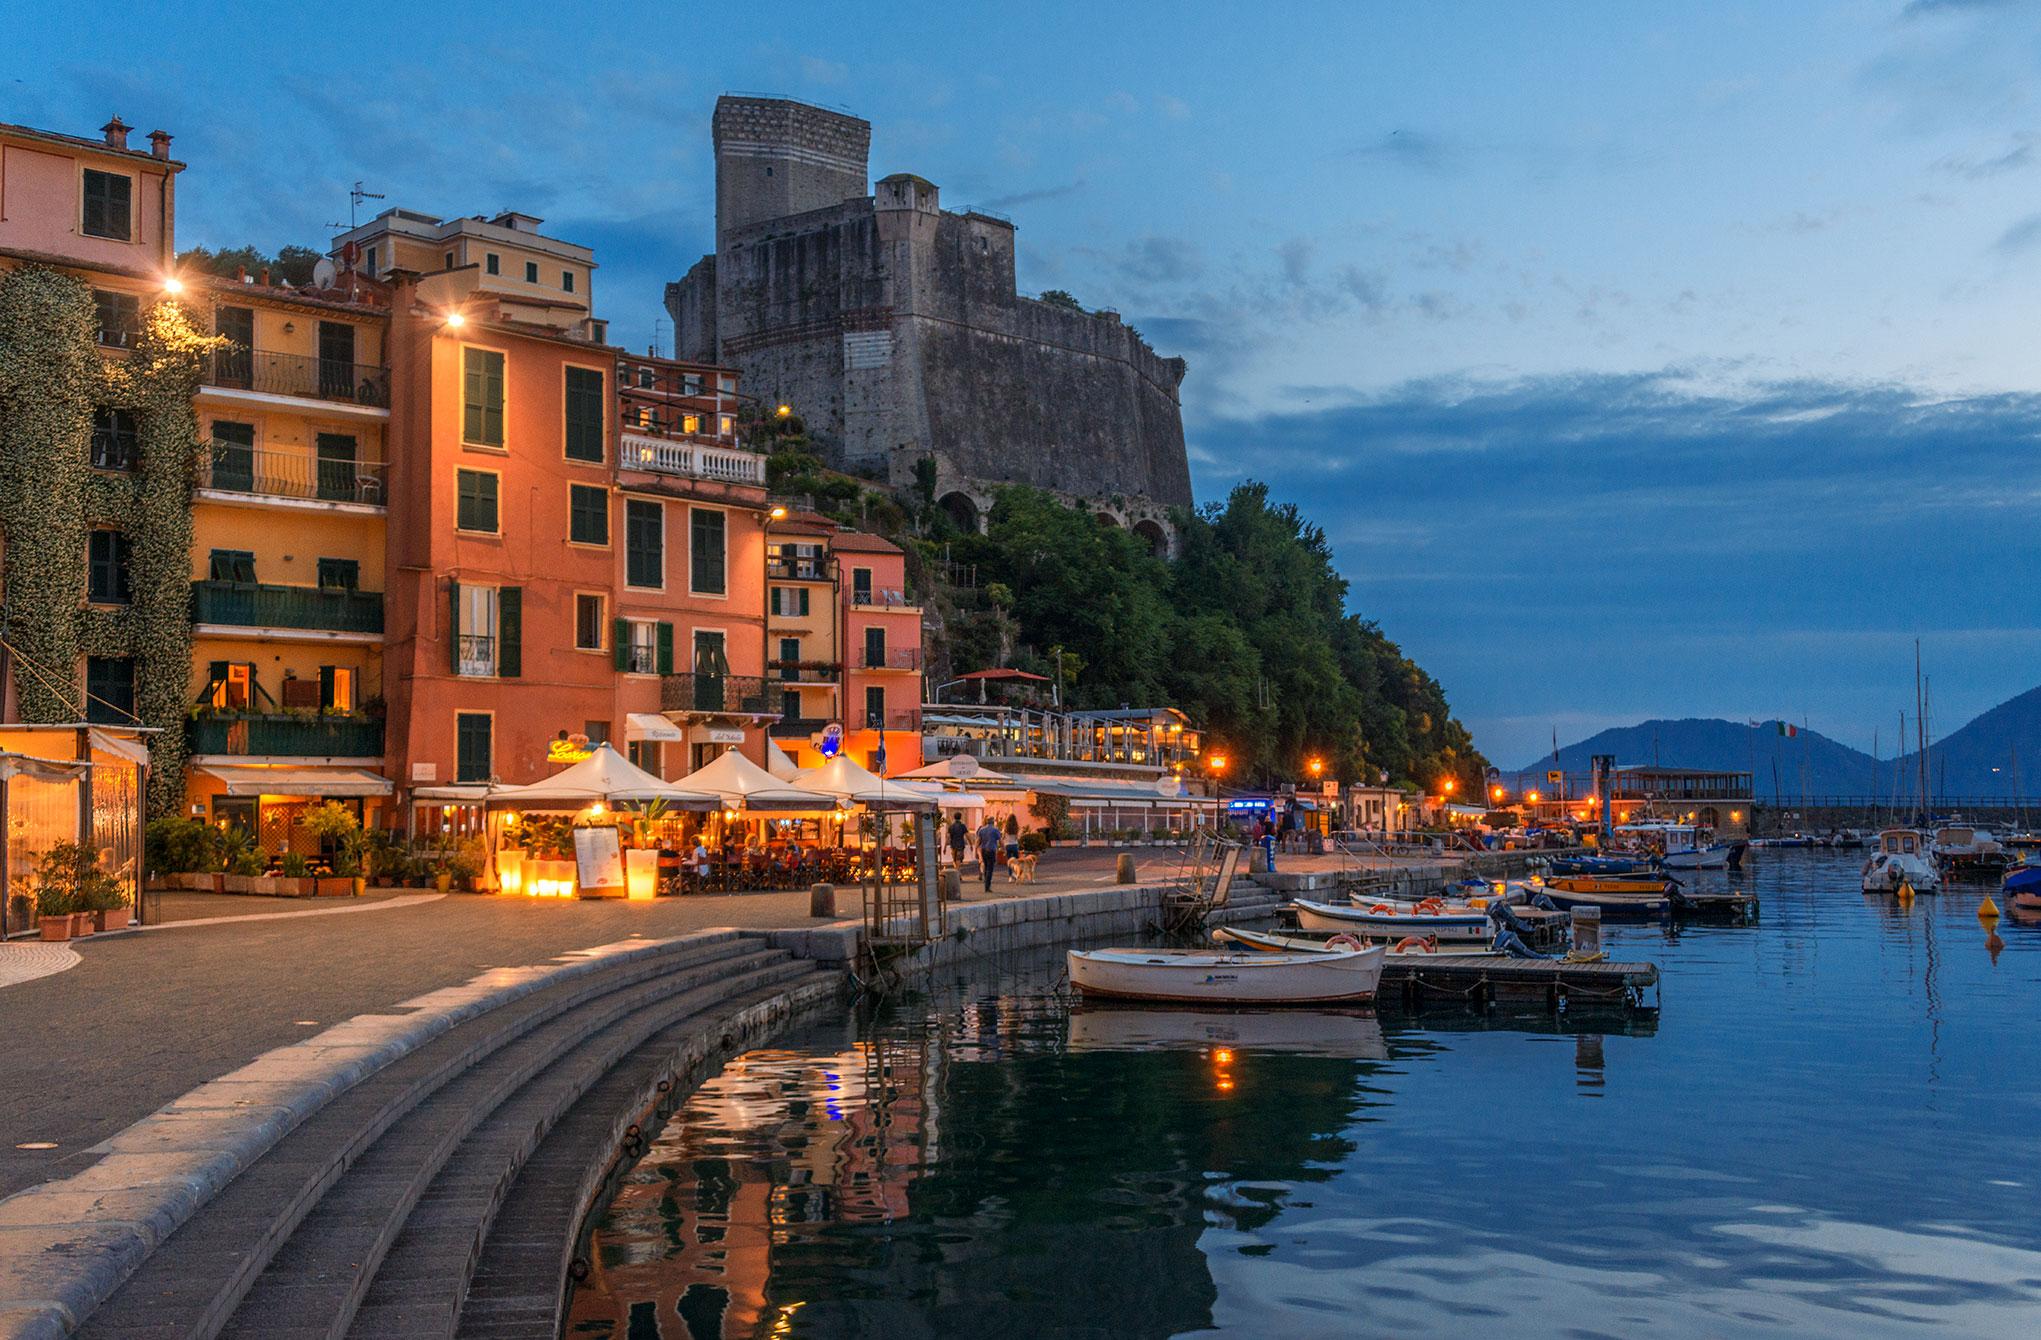 Lerici harbour at dusk